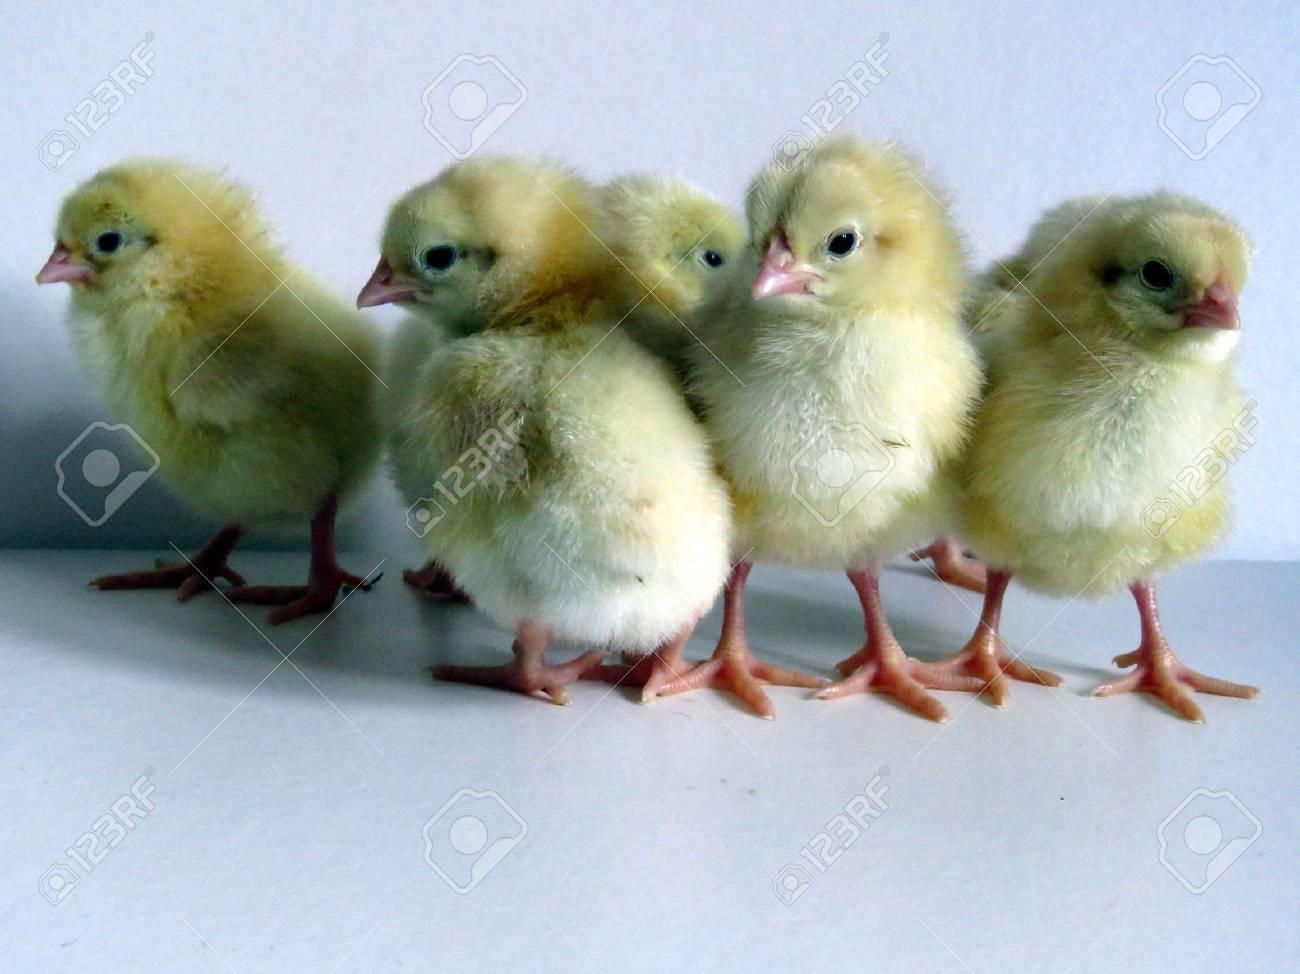 Baby Chicks Standard-Bild - 41695430